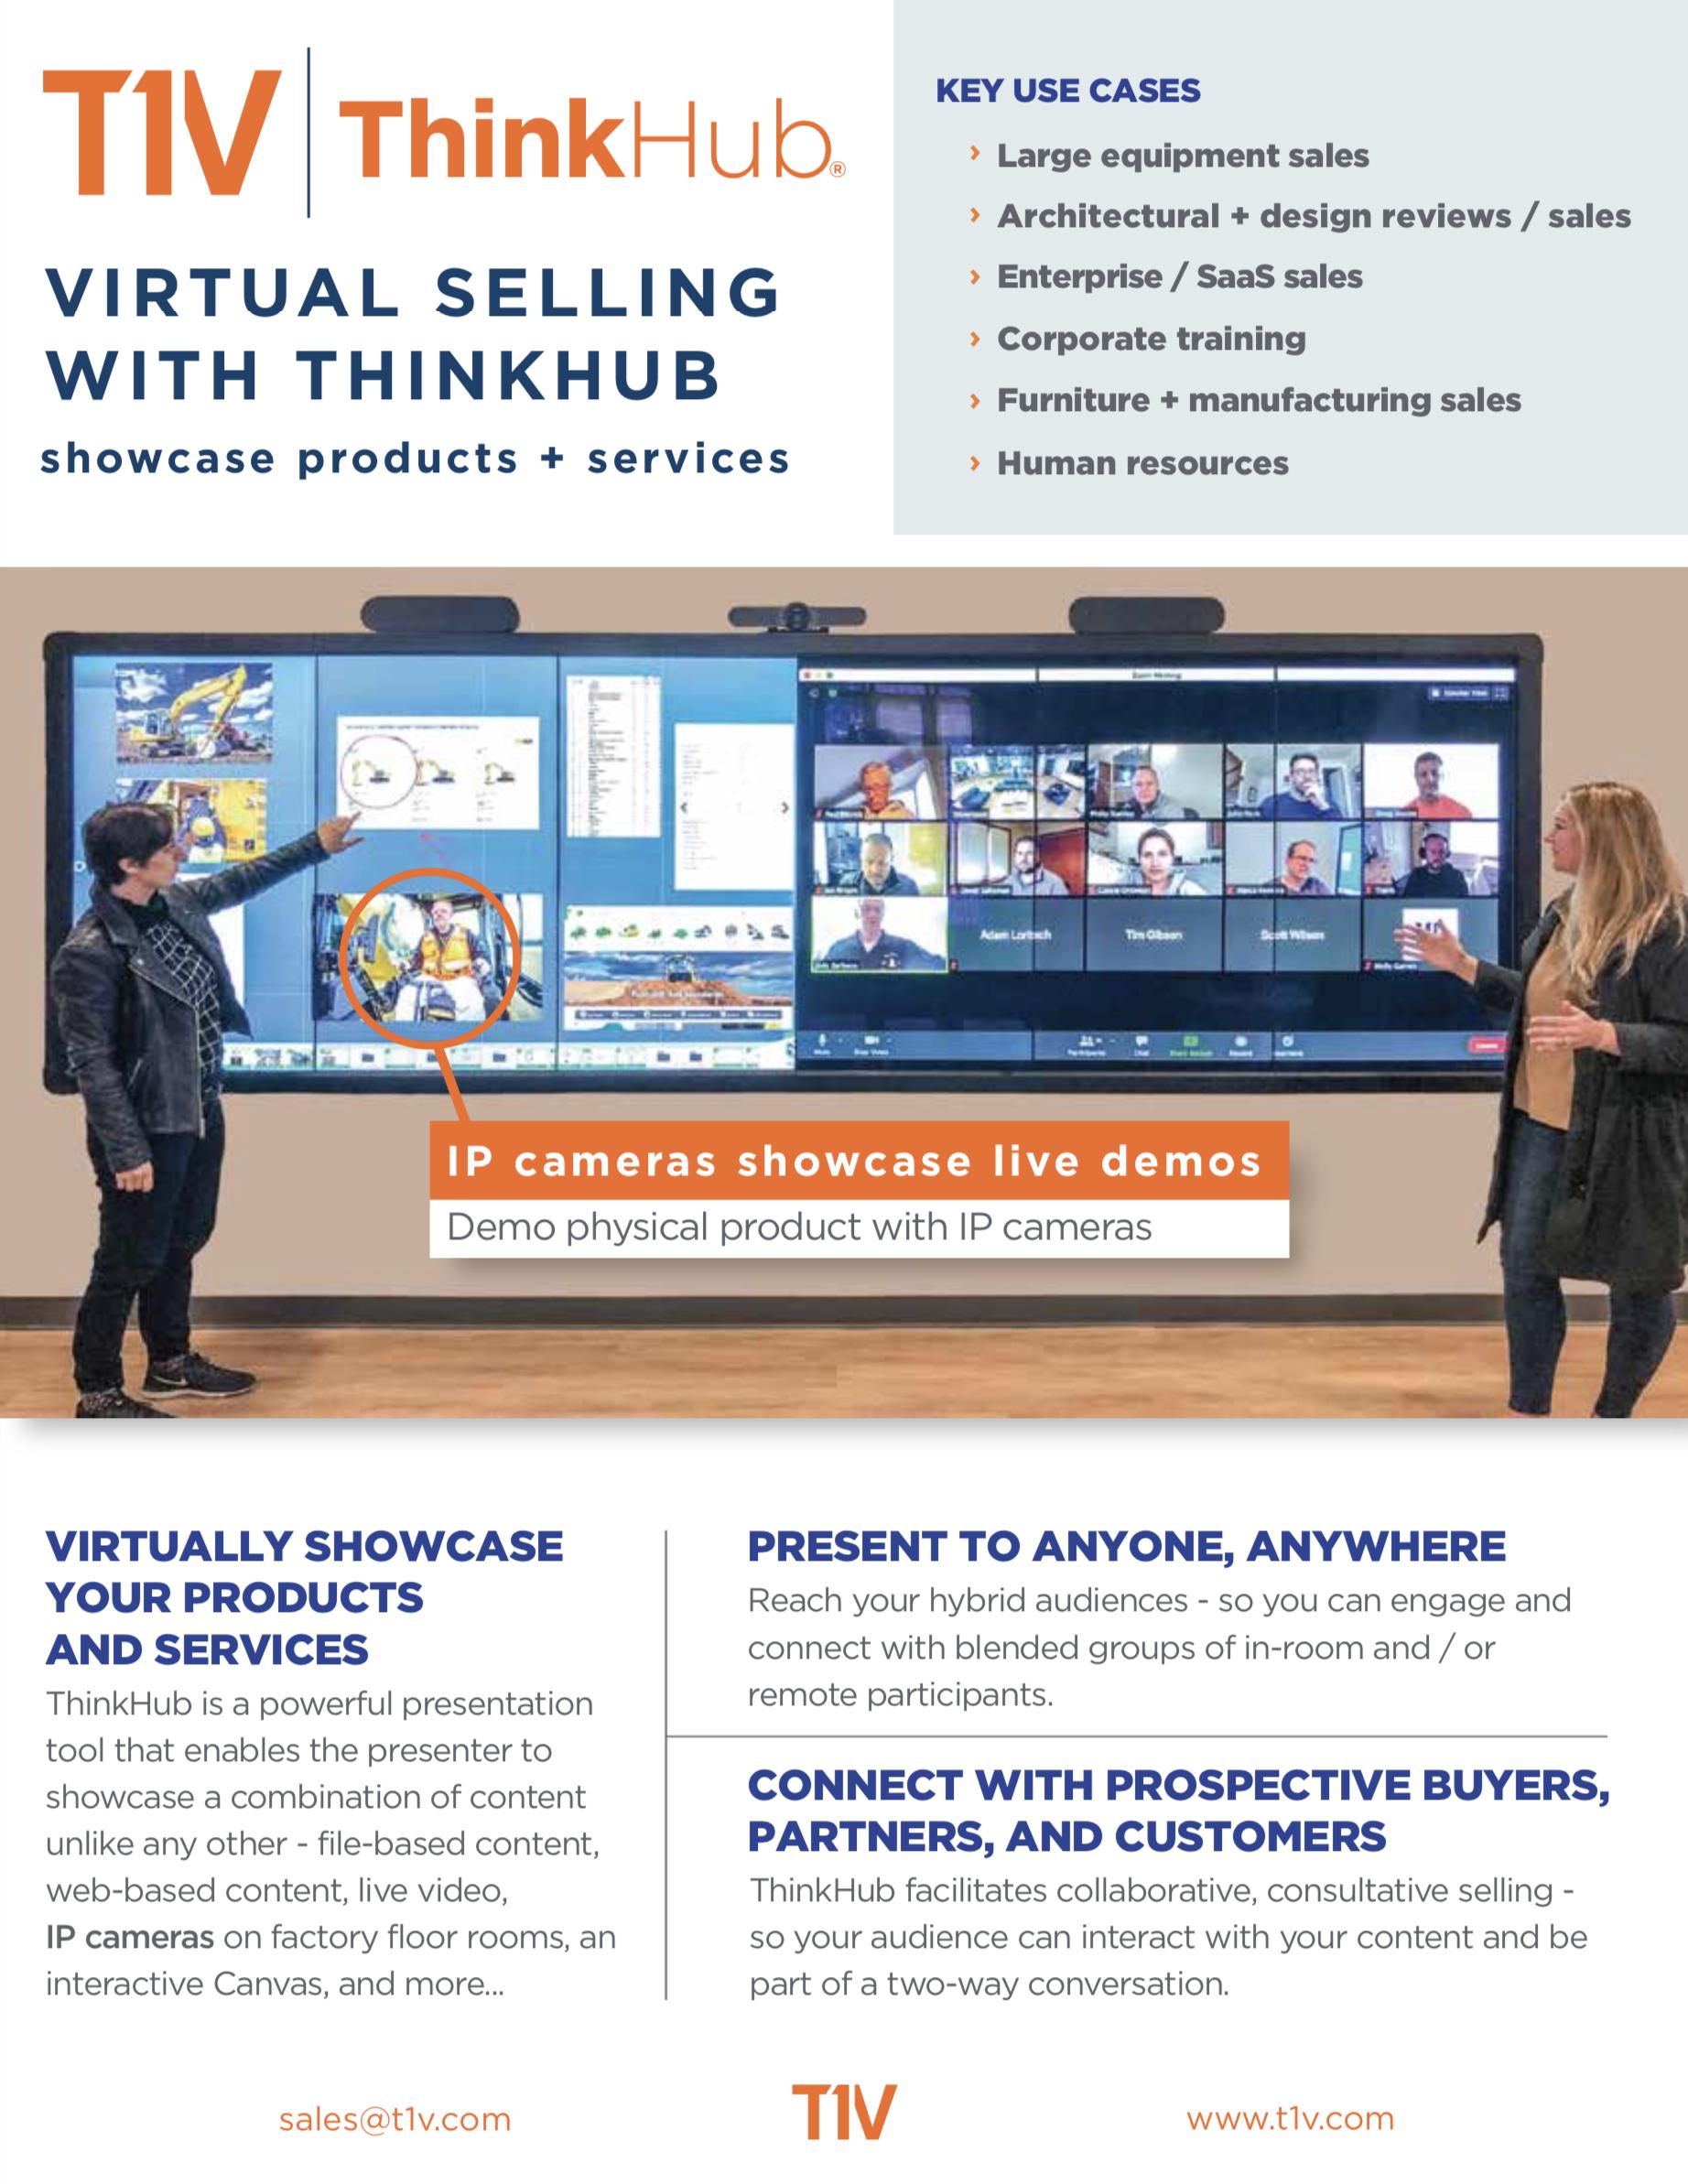 Virtual Selling with ThinkHub